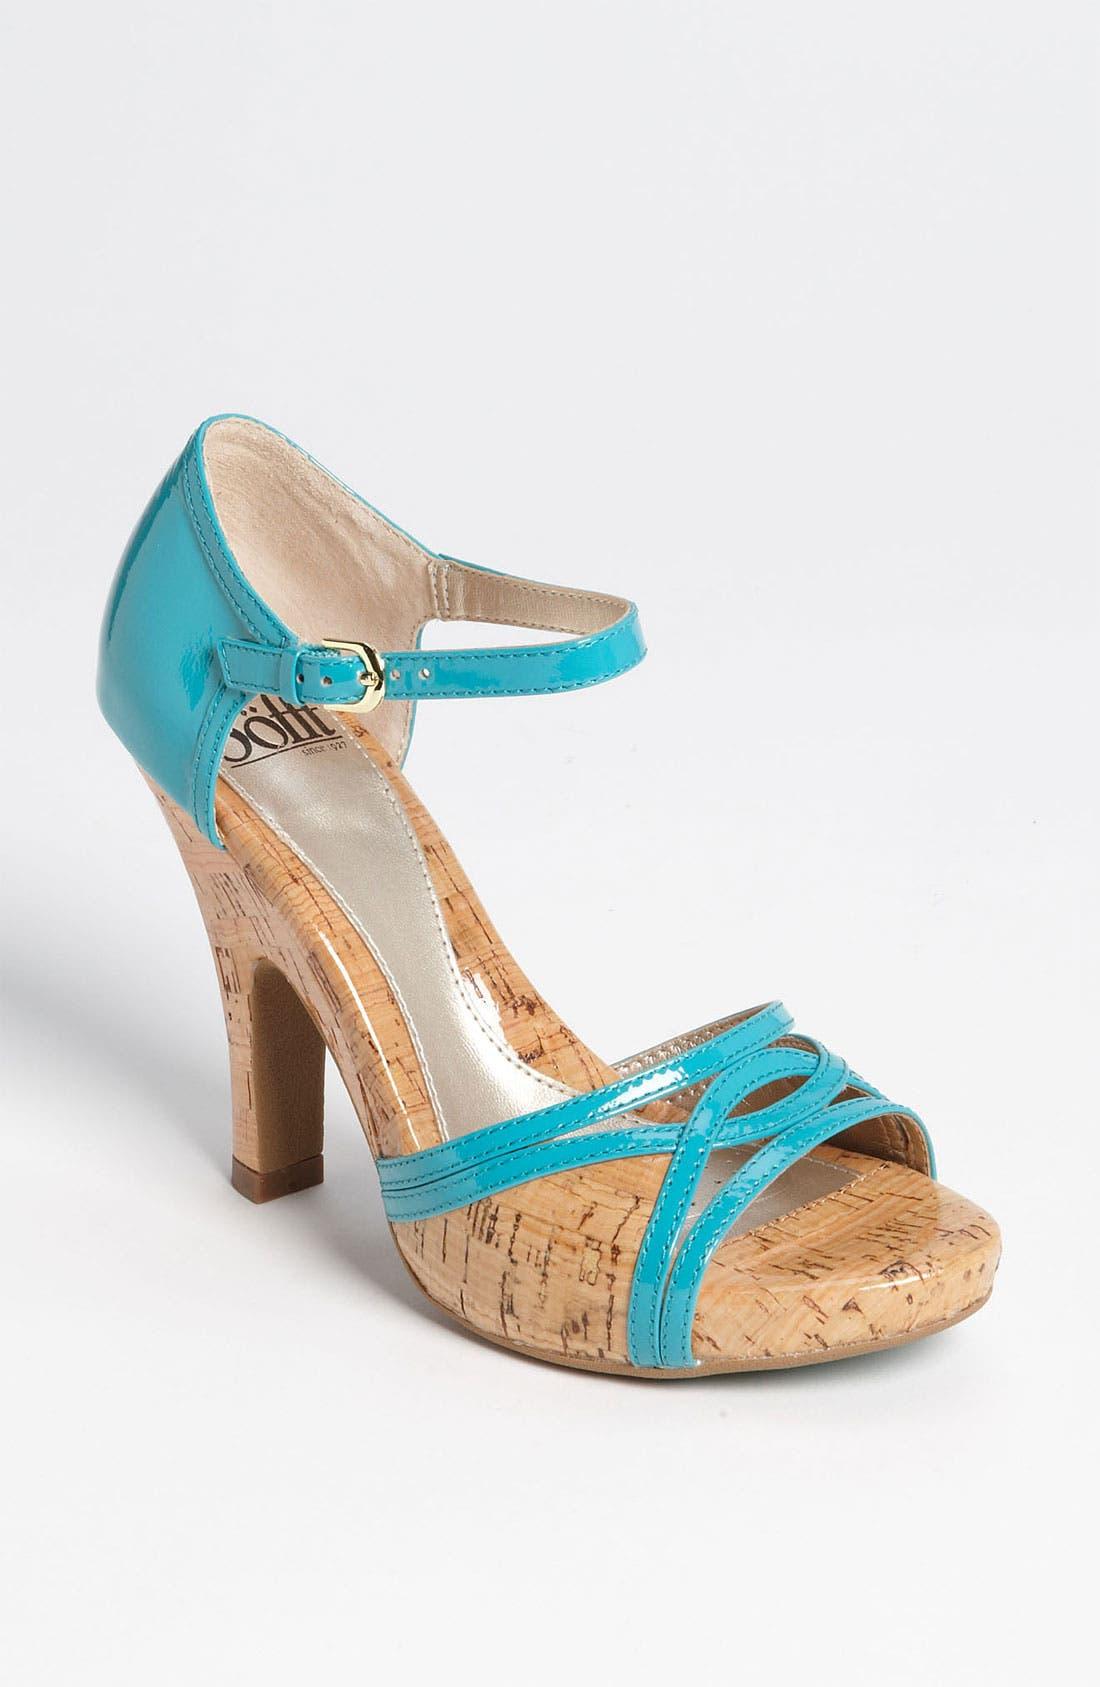 Alternate Image 1 Selected - Söfft 'Valeda' Sandal